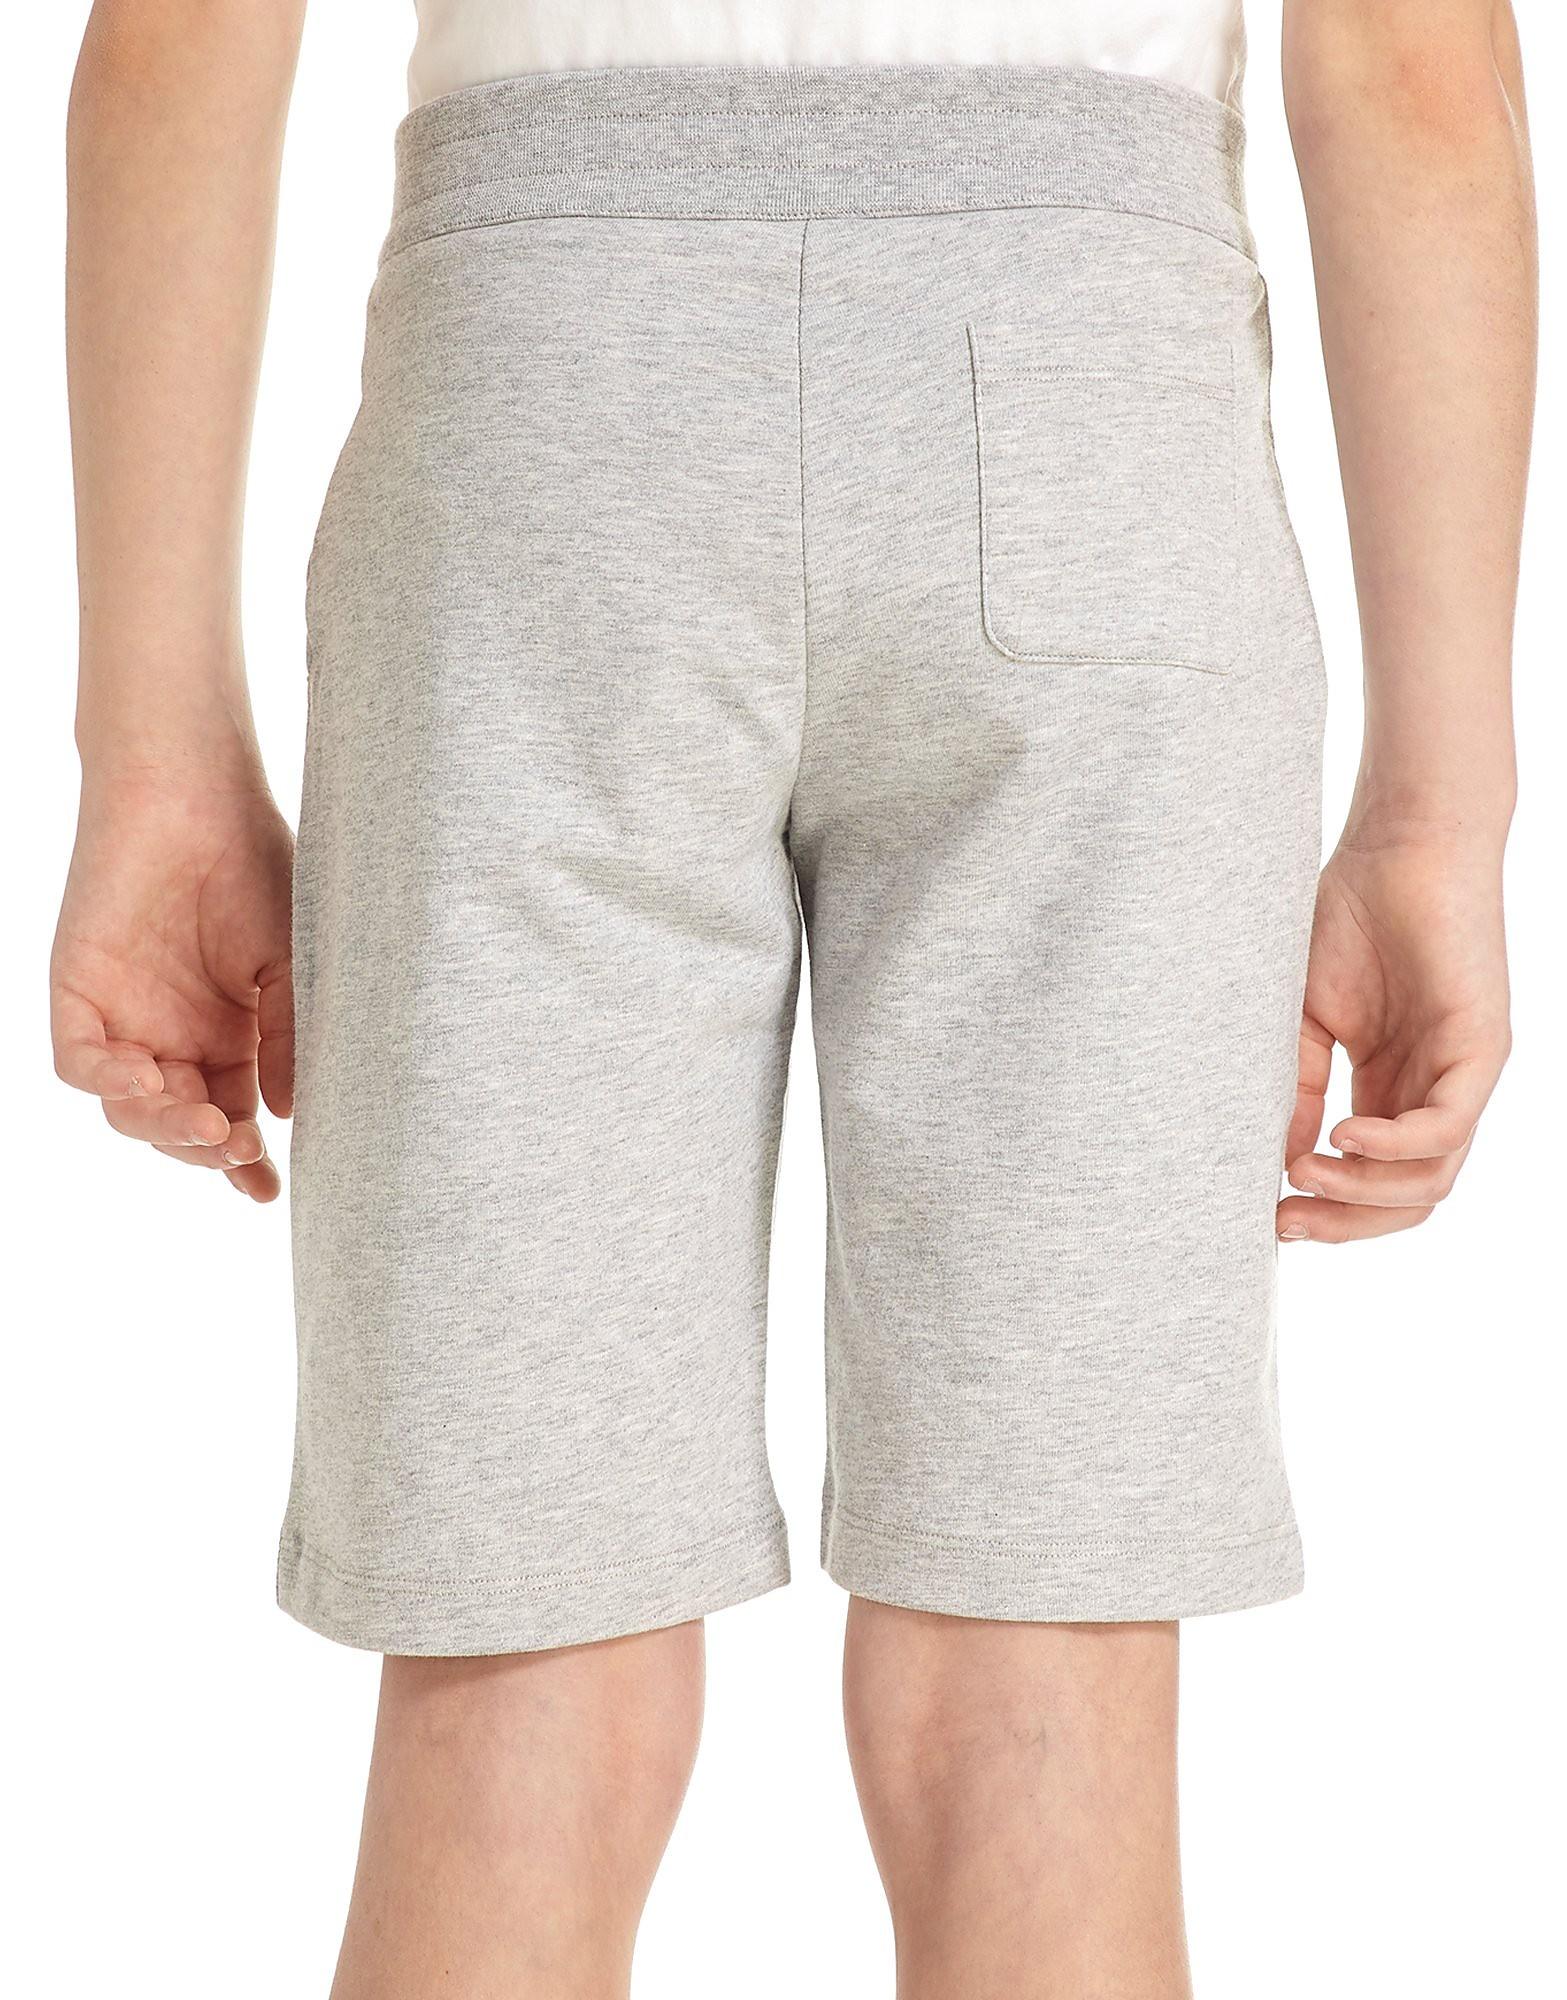 Emporio Armani EA7 Pantalones cortos Core Fleece júnior